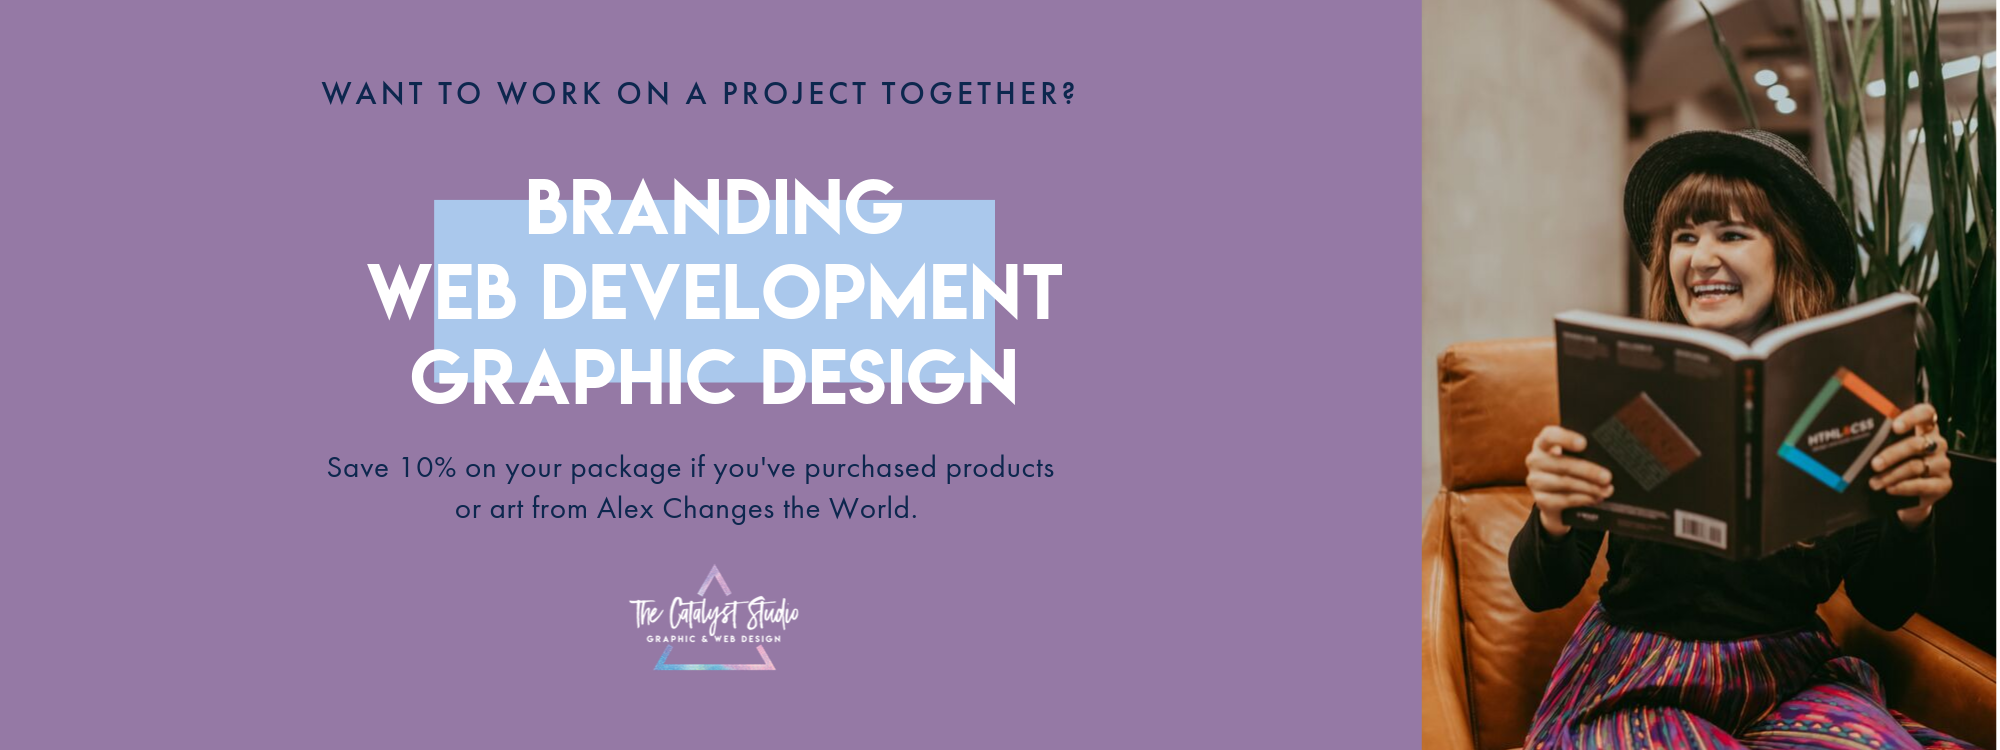 The Catalyst Studio Ad.png